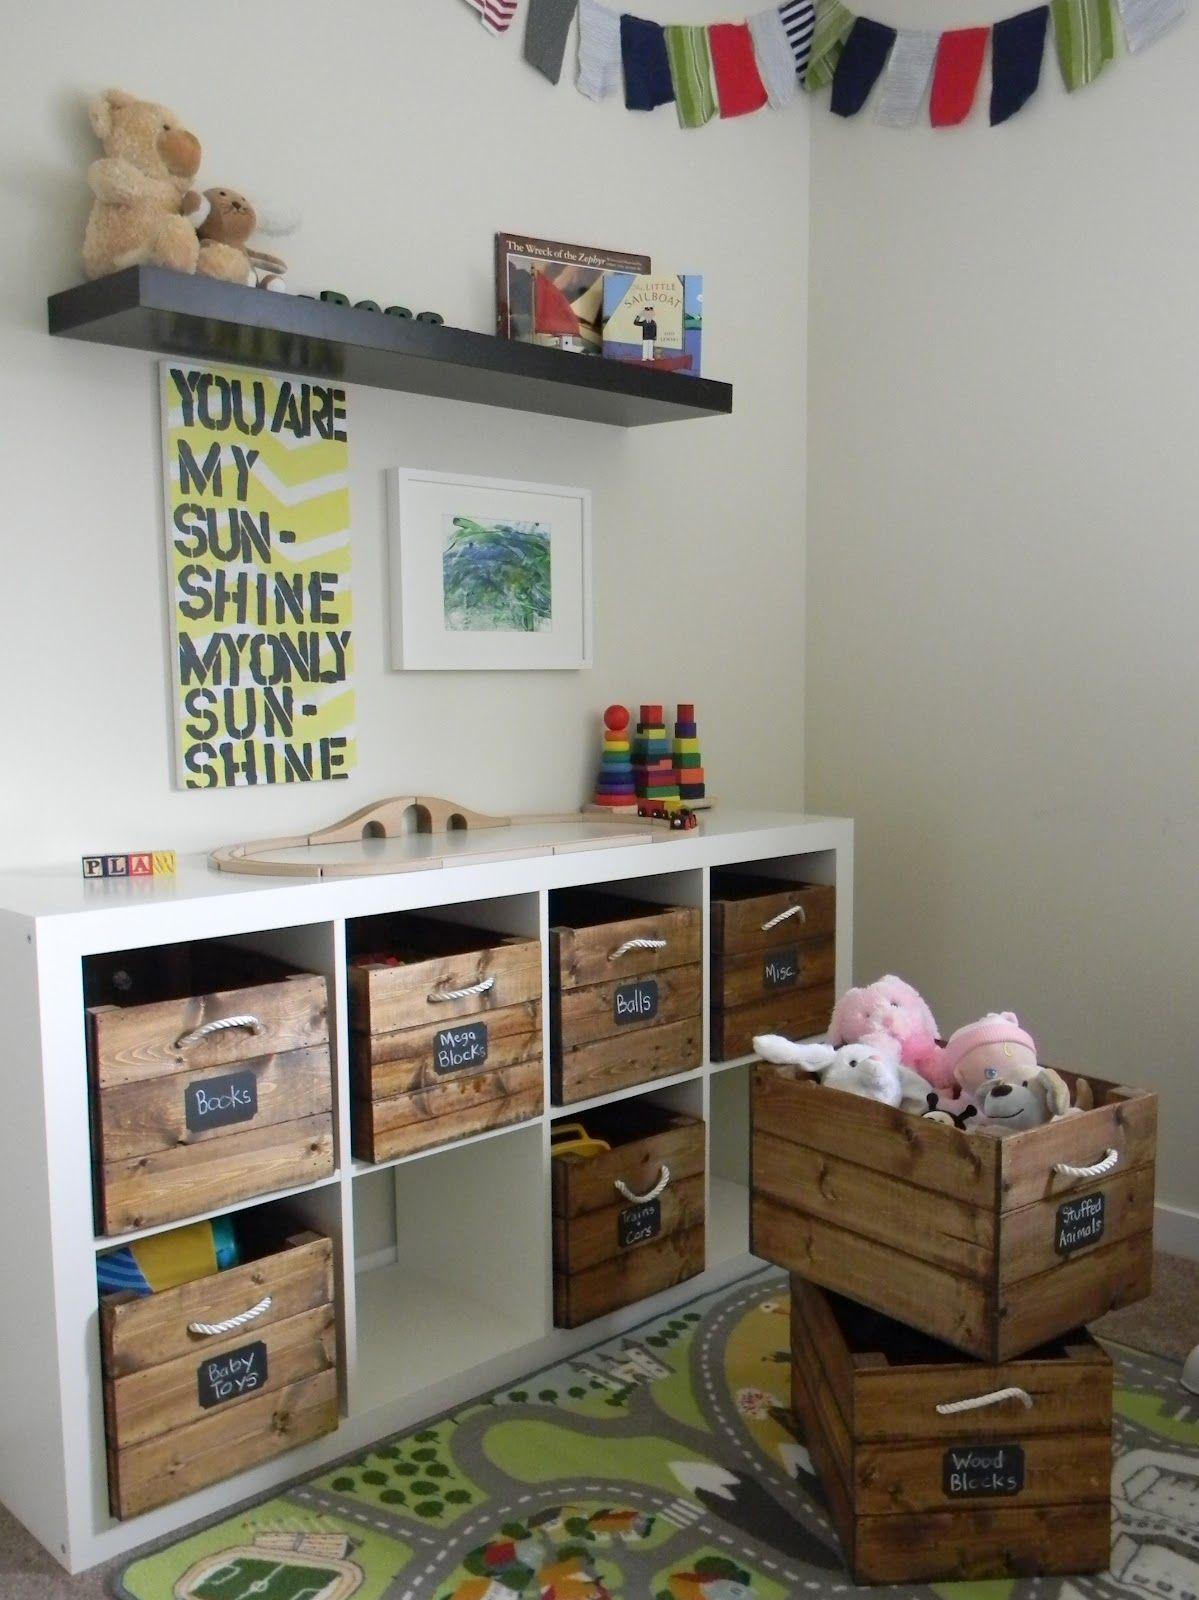 Kids Storage Cube Organizer Toy Box Kids Bedroom Furniture: Pin By Dana Williams On My Boys In 2019